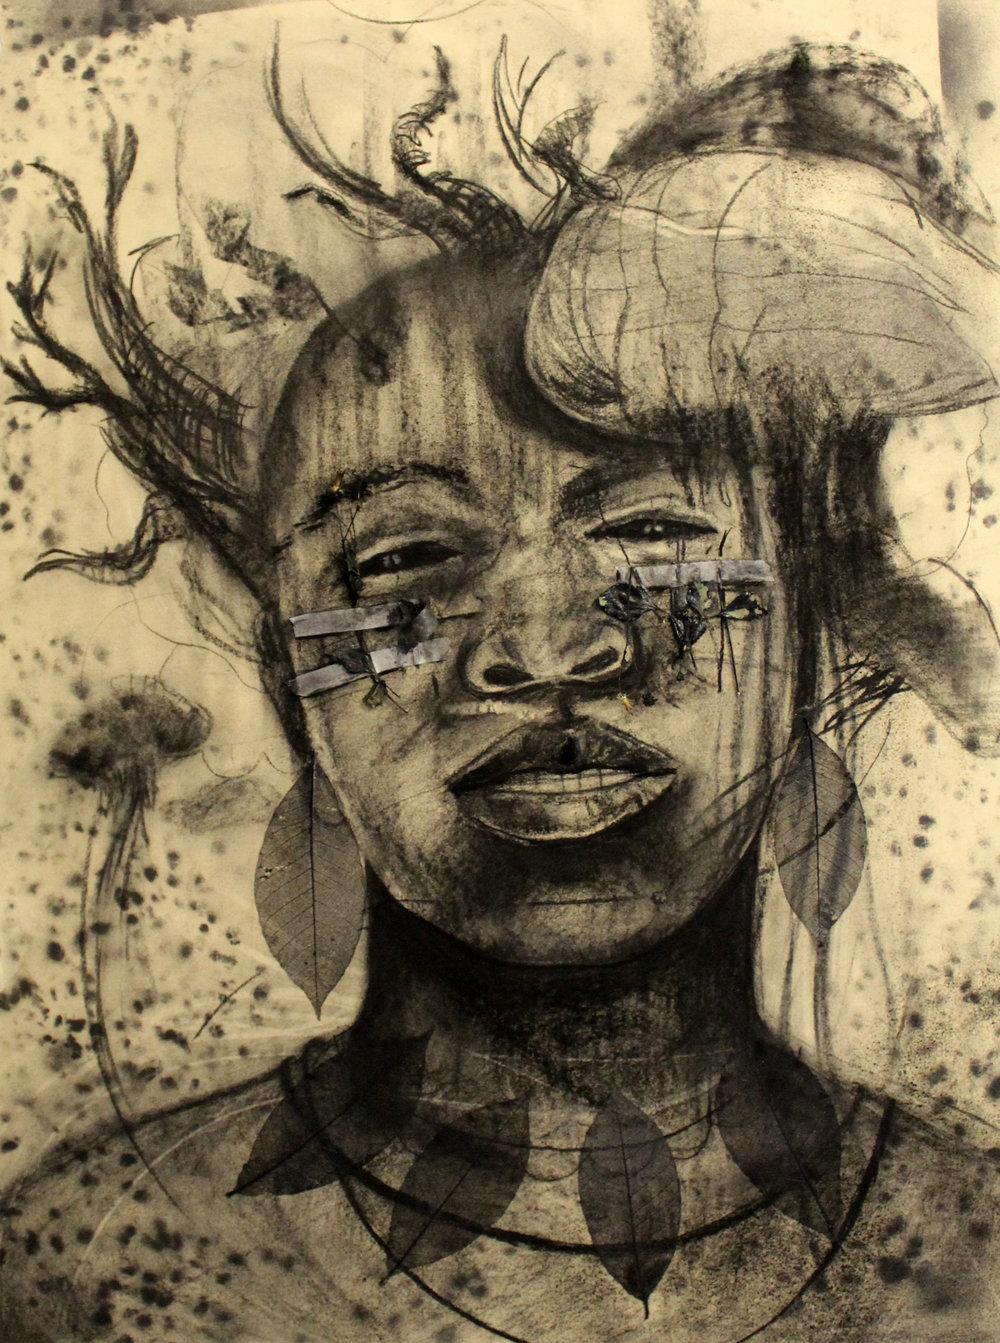 "Man of War - Skin, Teeth & Bare bones  (Carbon Drawing, El Portal, N.E. 86 St) Medium: Assorted Charcoal Densities, Aerosol Black, Flora & Fauna Dimension: 22"" x 30"" Year: 2018"